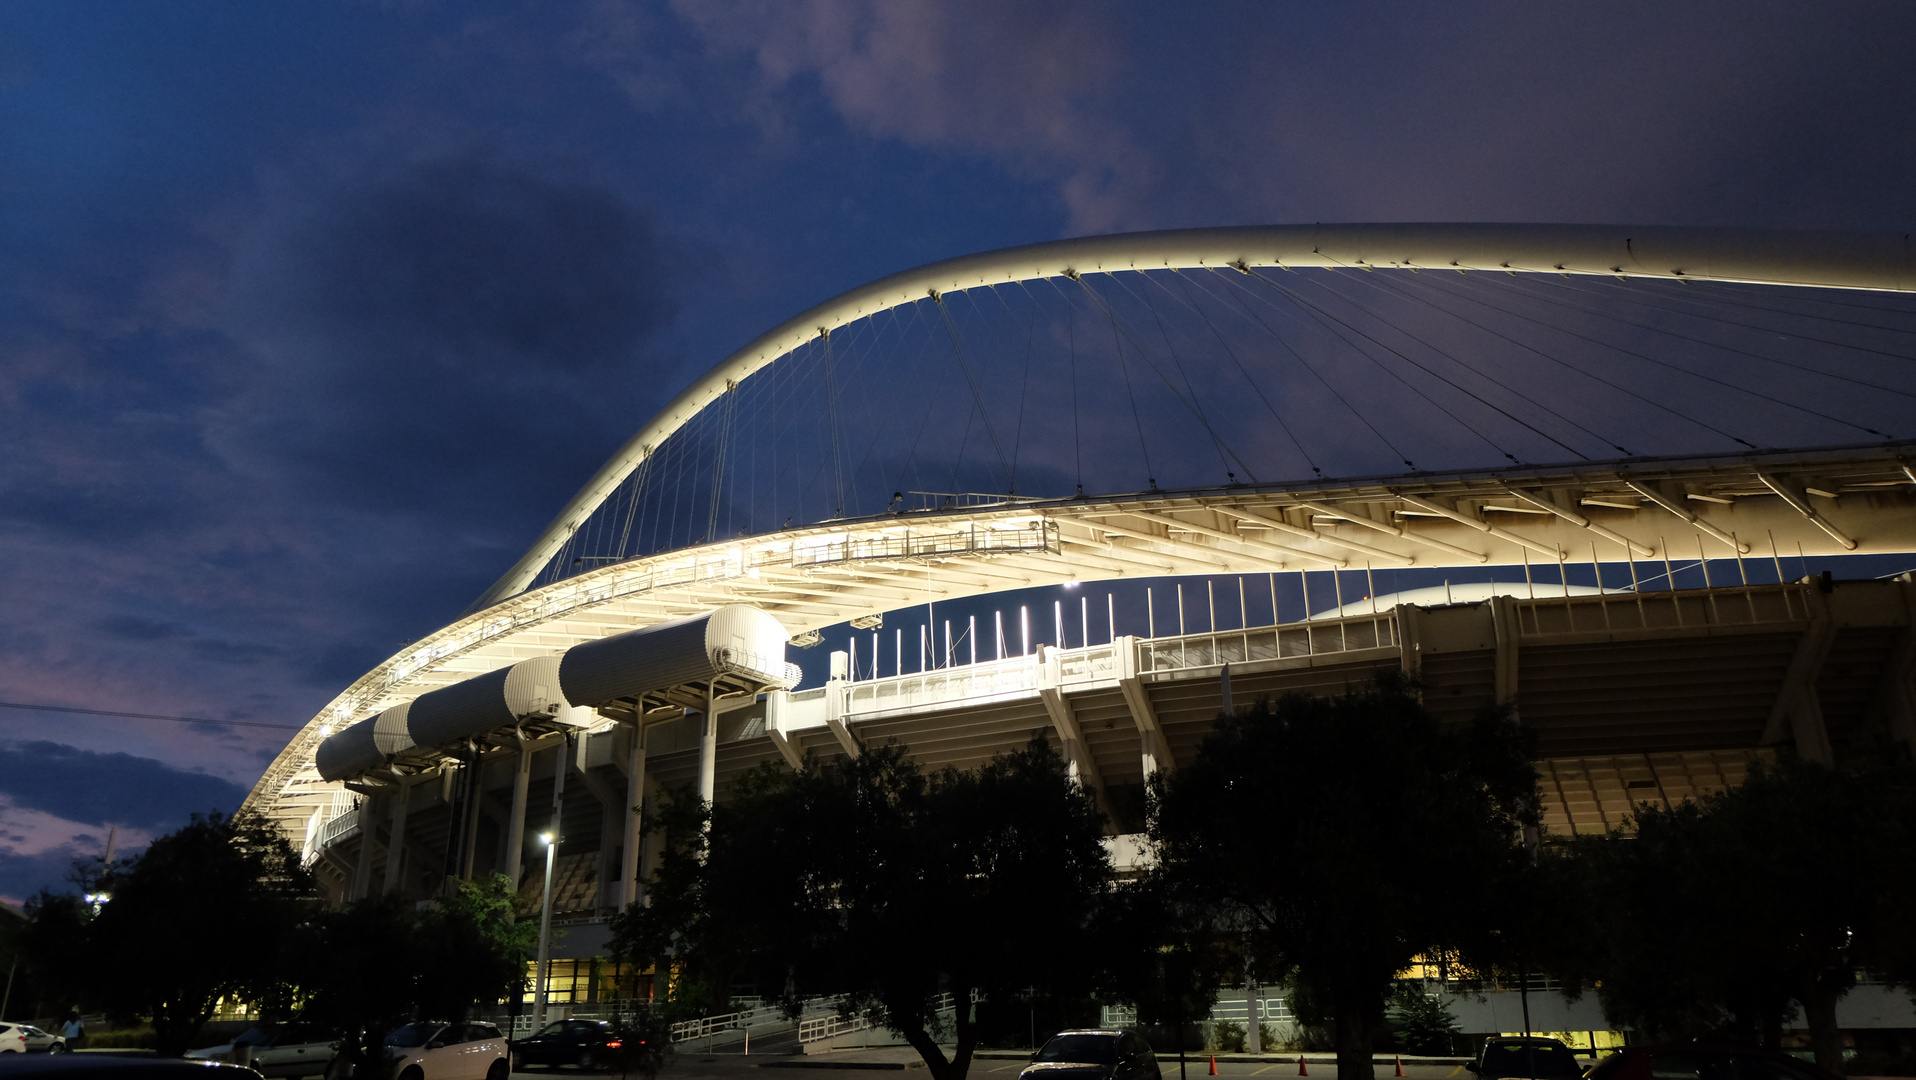 Athens (7) - Olympic Stadion by night - Architect Santiago Calatrava